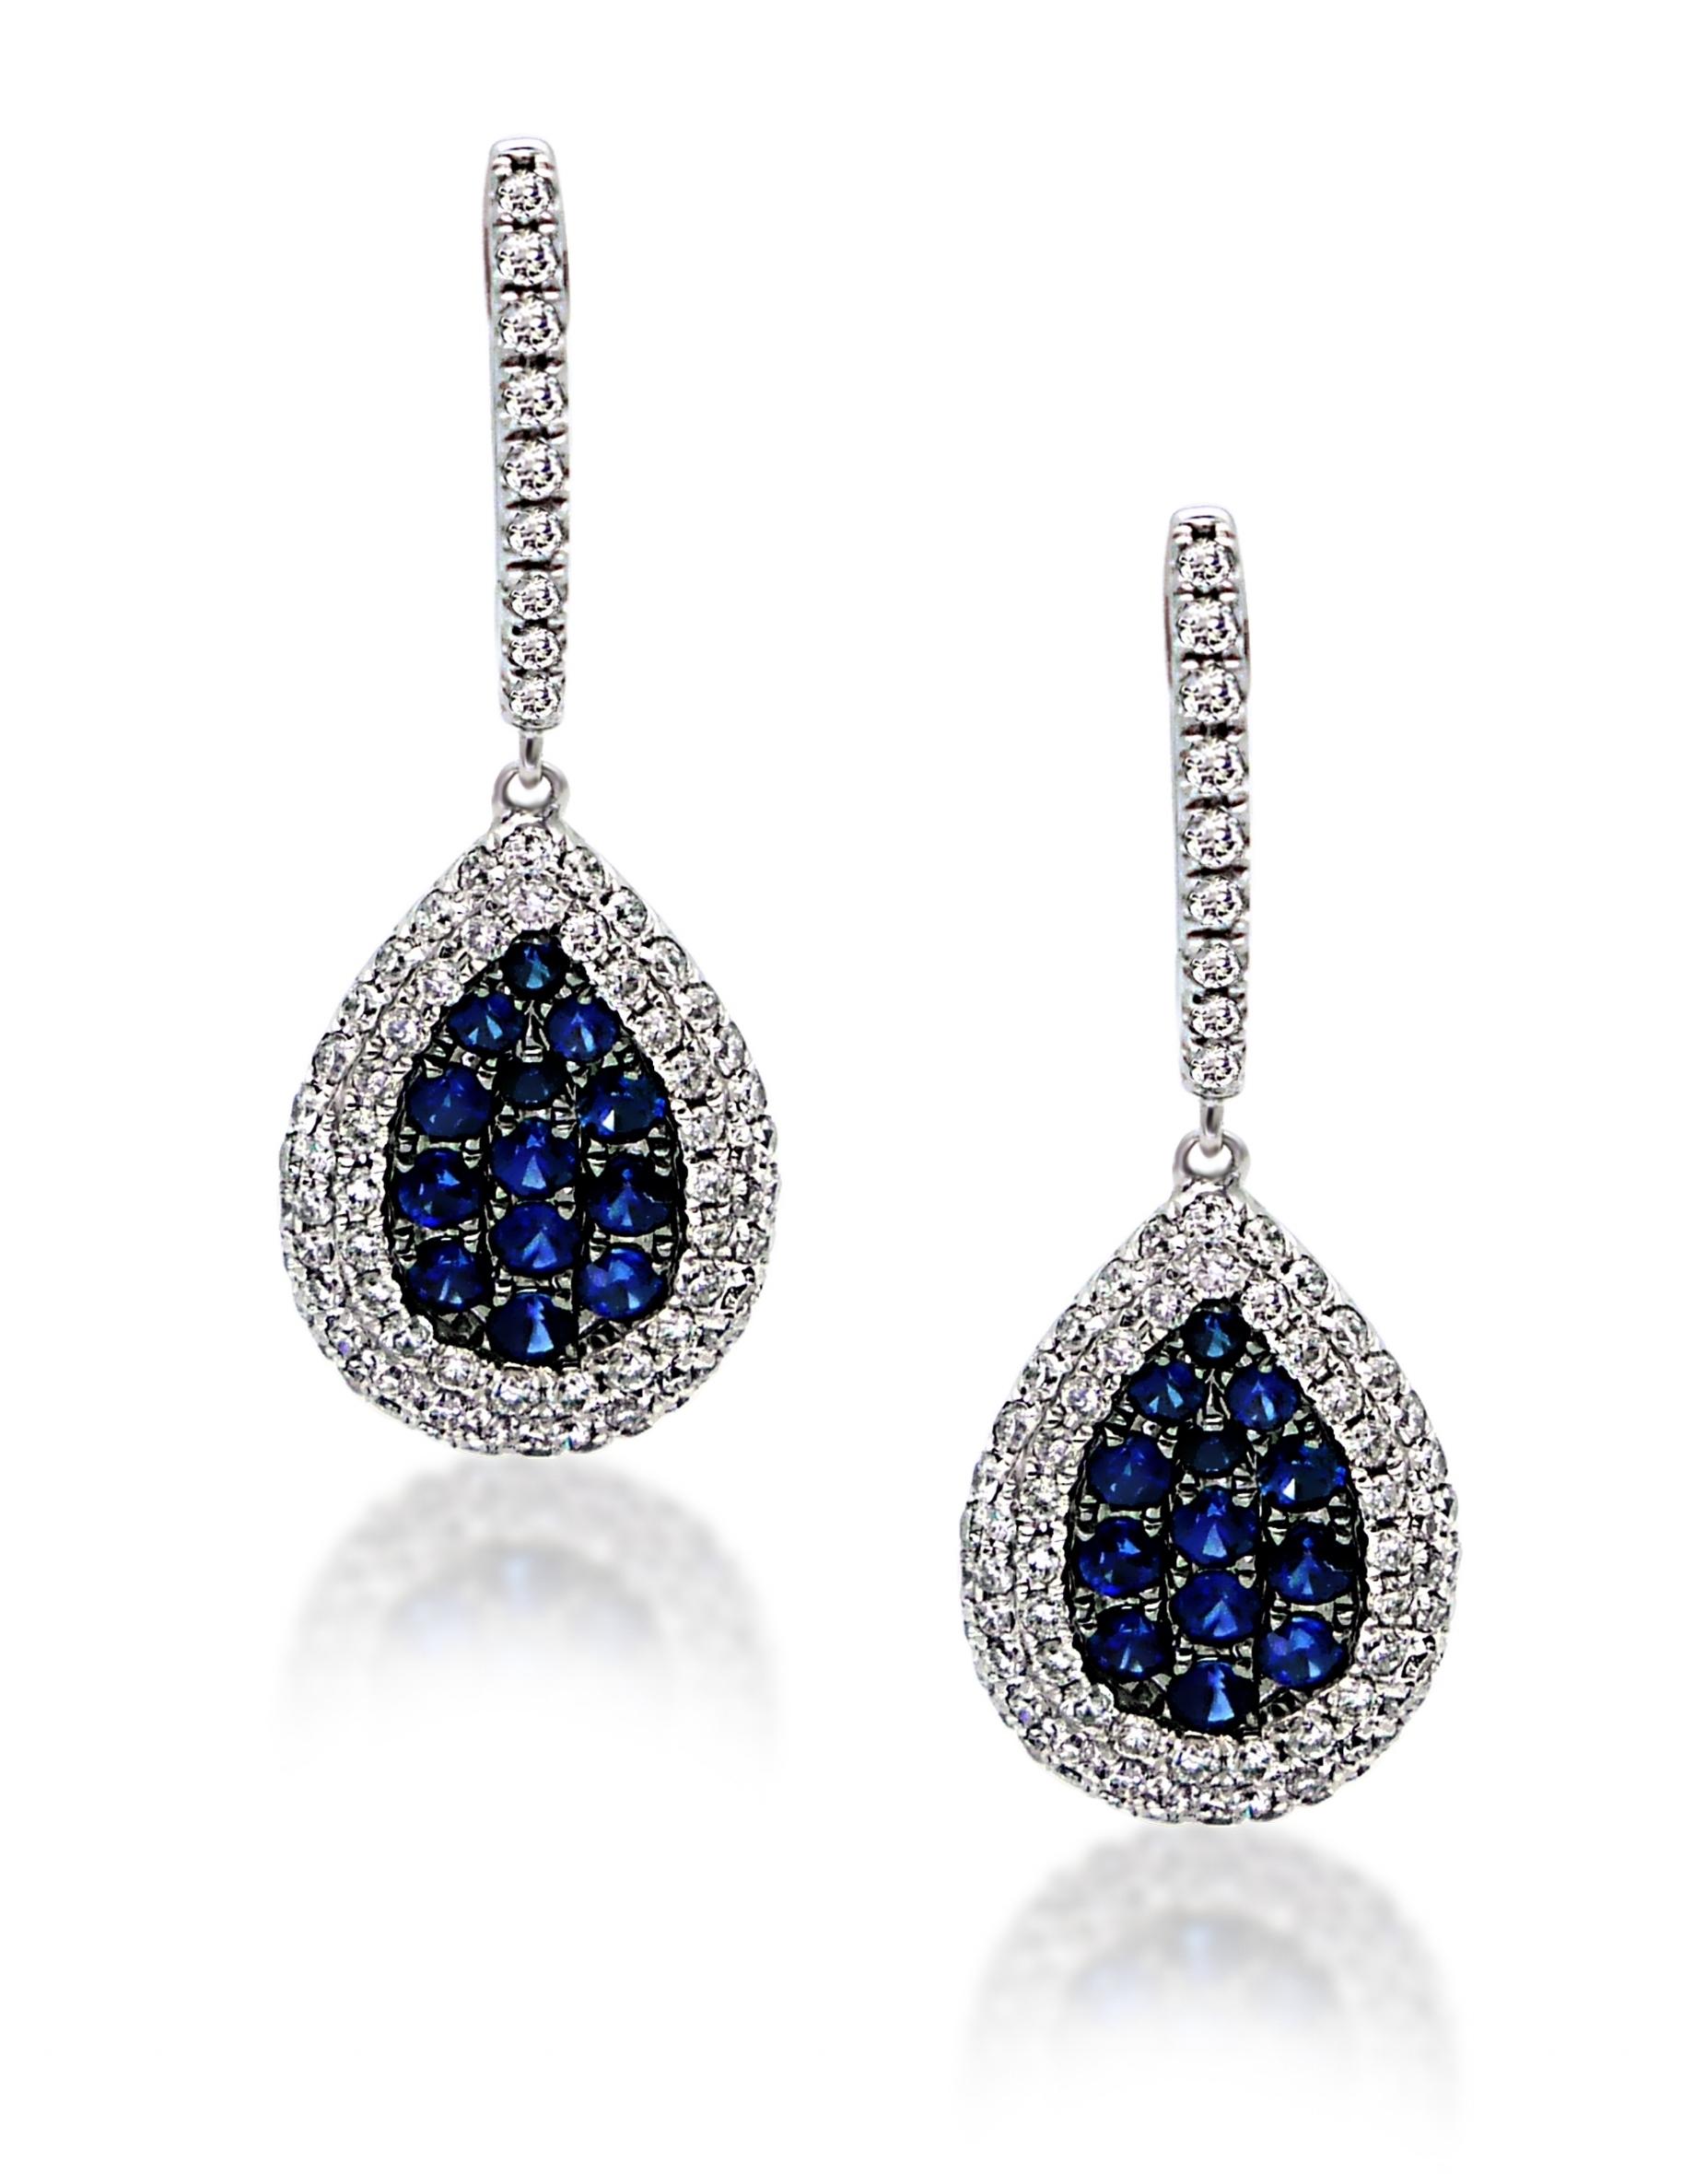 18KT White Gold Diamond and Ceylon Sapphire Earrings.